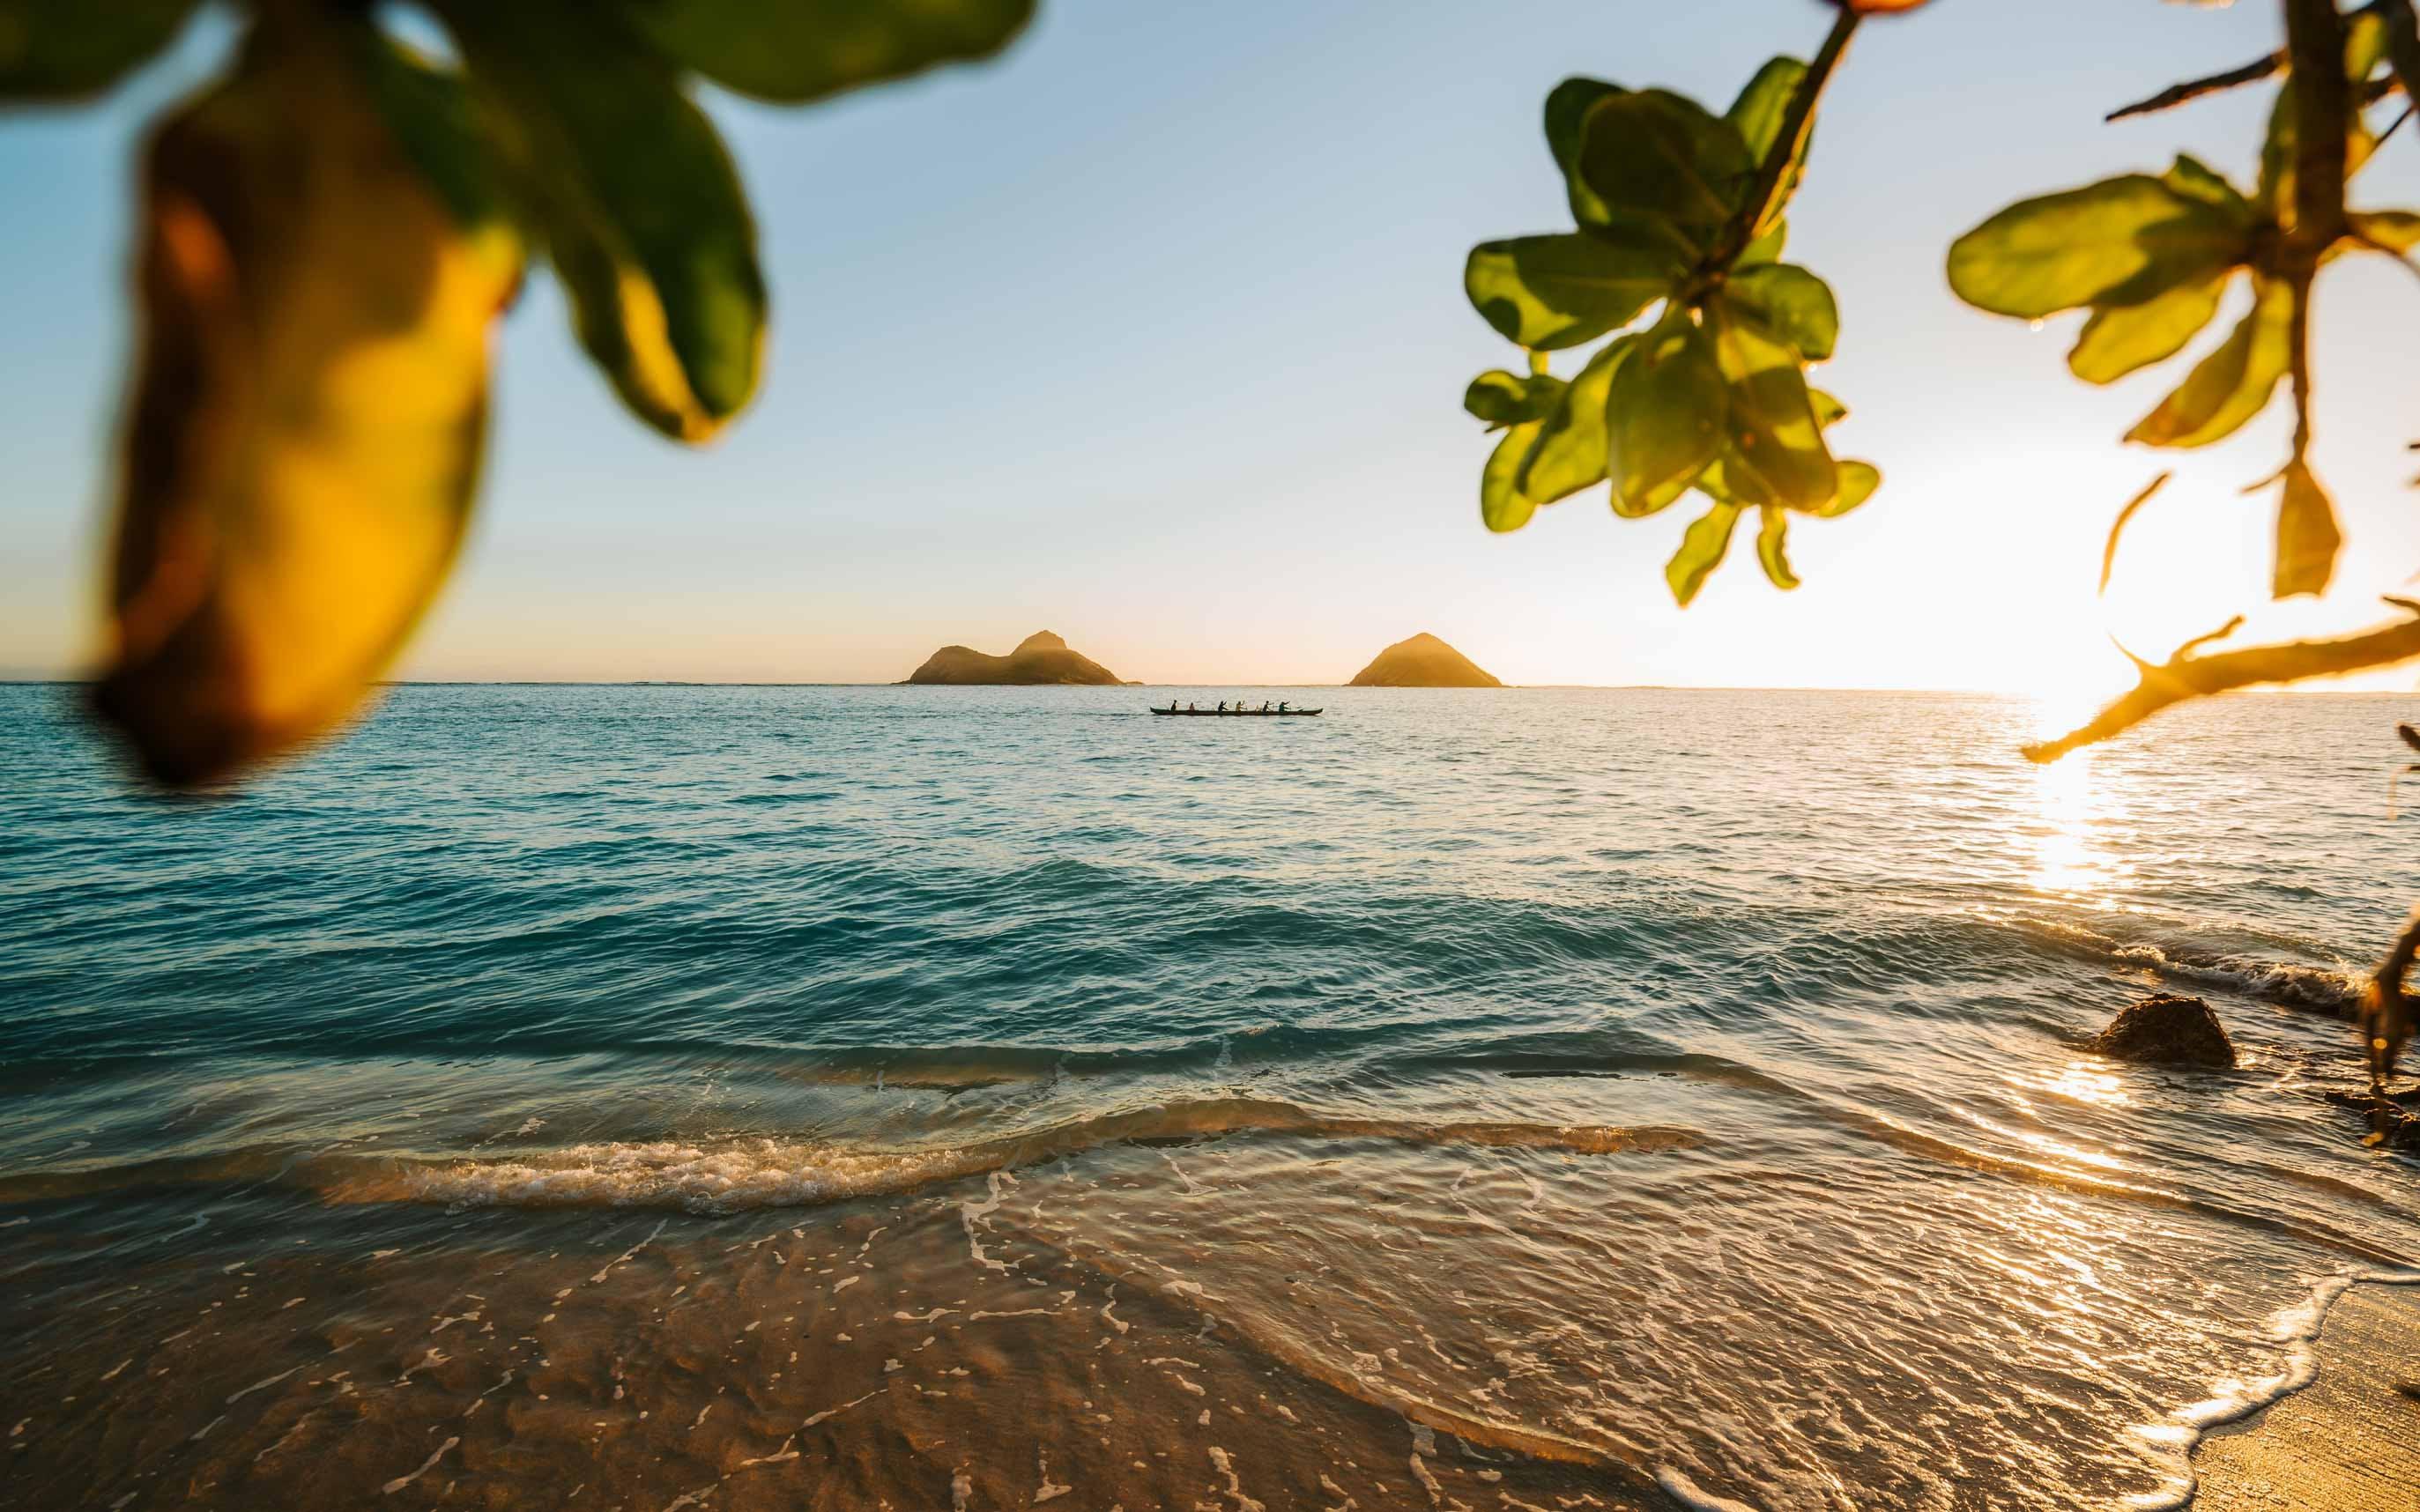 """Ocean Access 10"" at Lanikai Beach view of the Ocean, Moku Nui & Moku Iki"